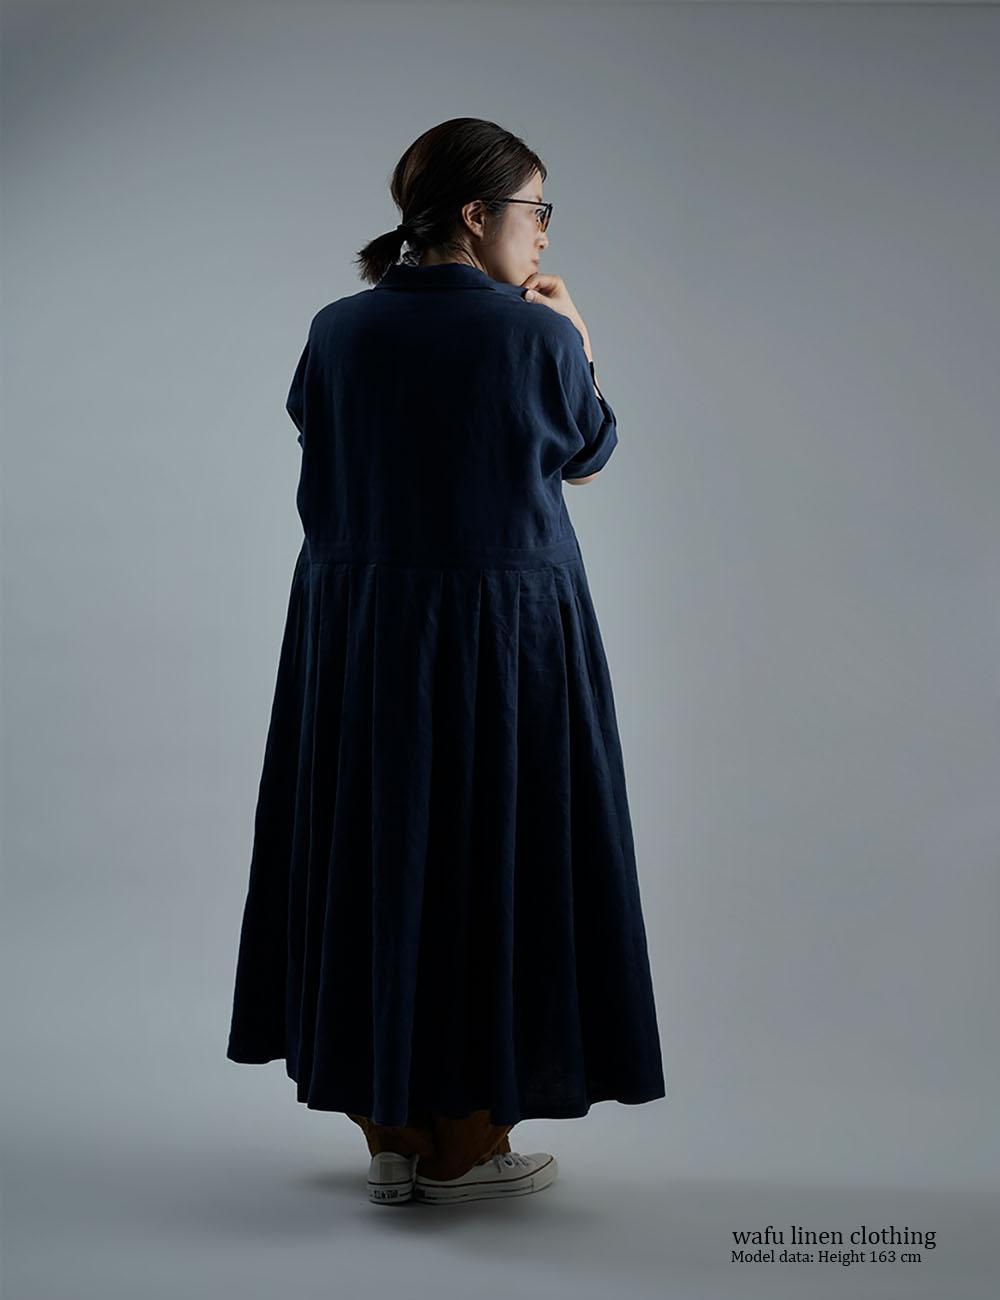 【wafu】Linen Dress   2wey ワンピース  アウターにも / 留紺 a064a-tmk1